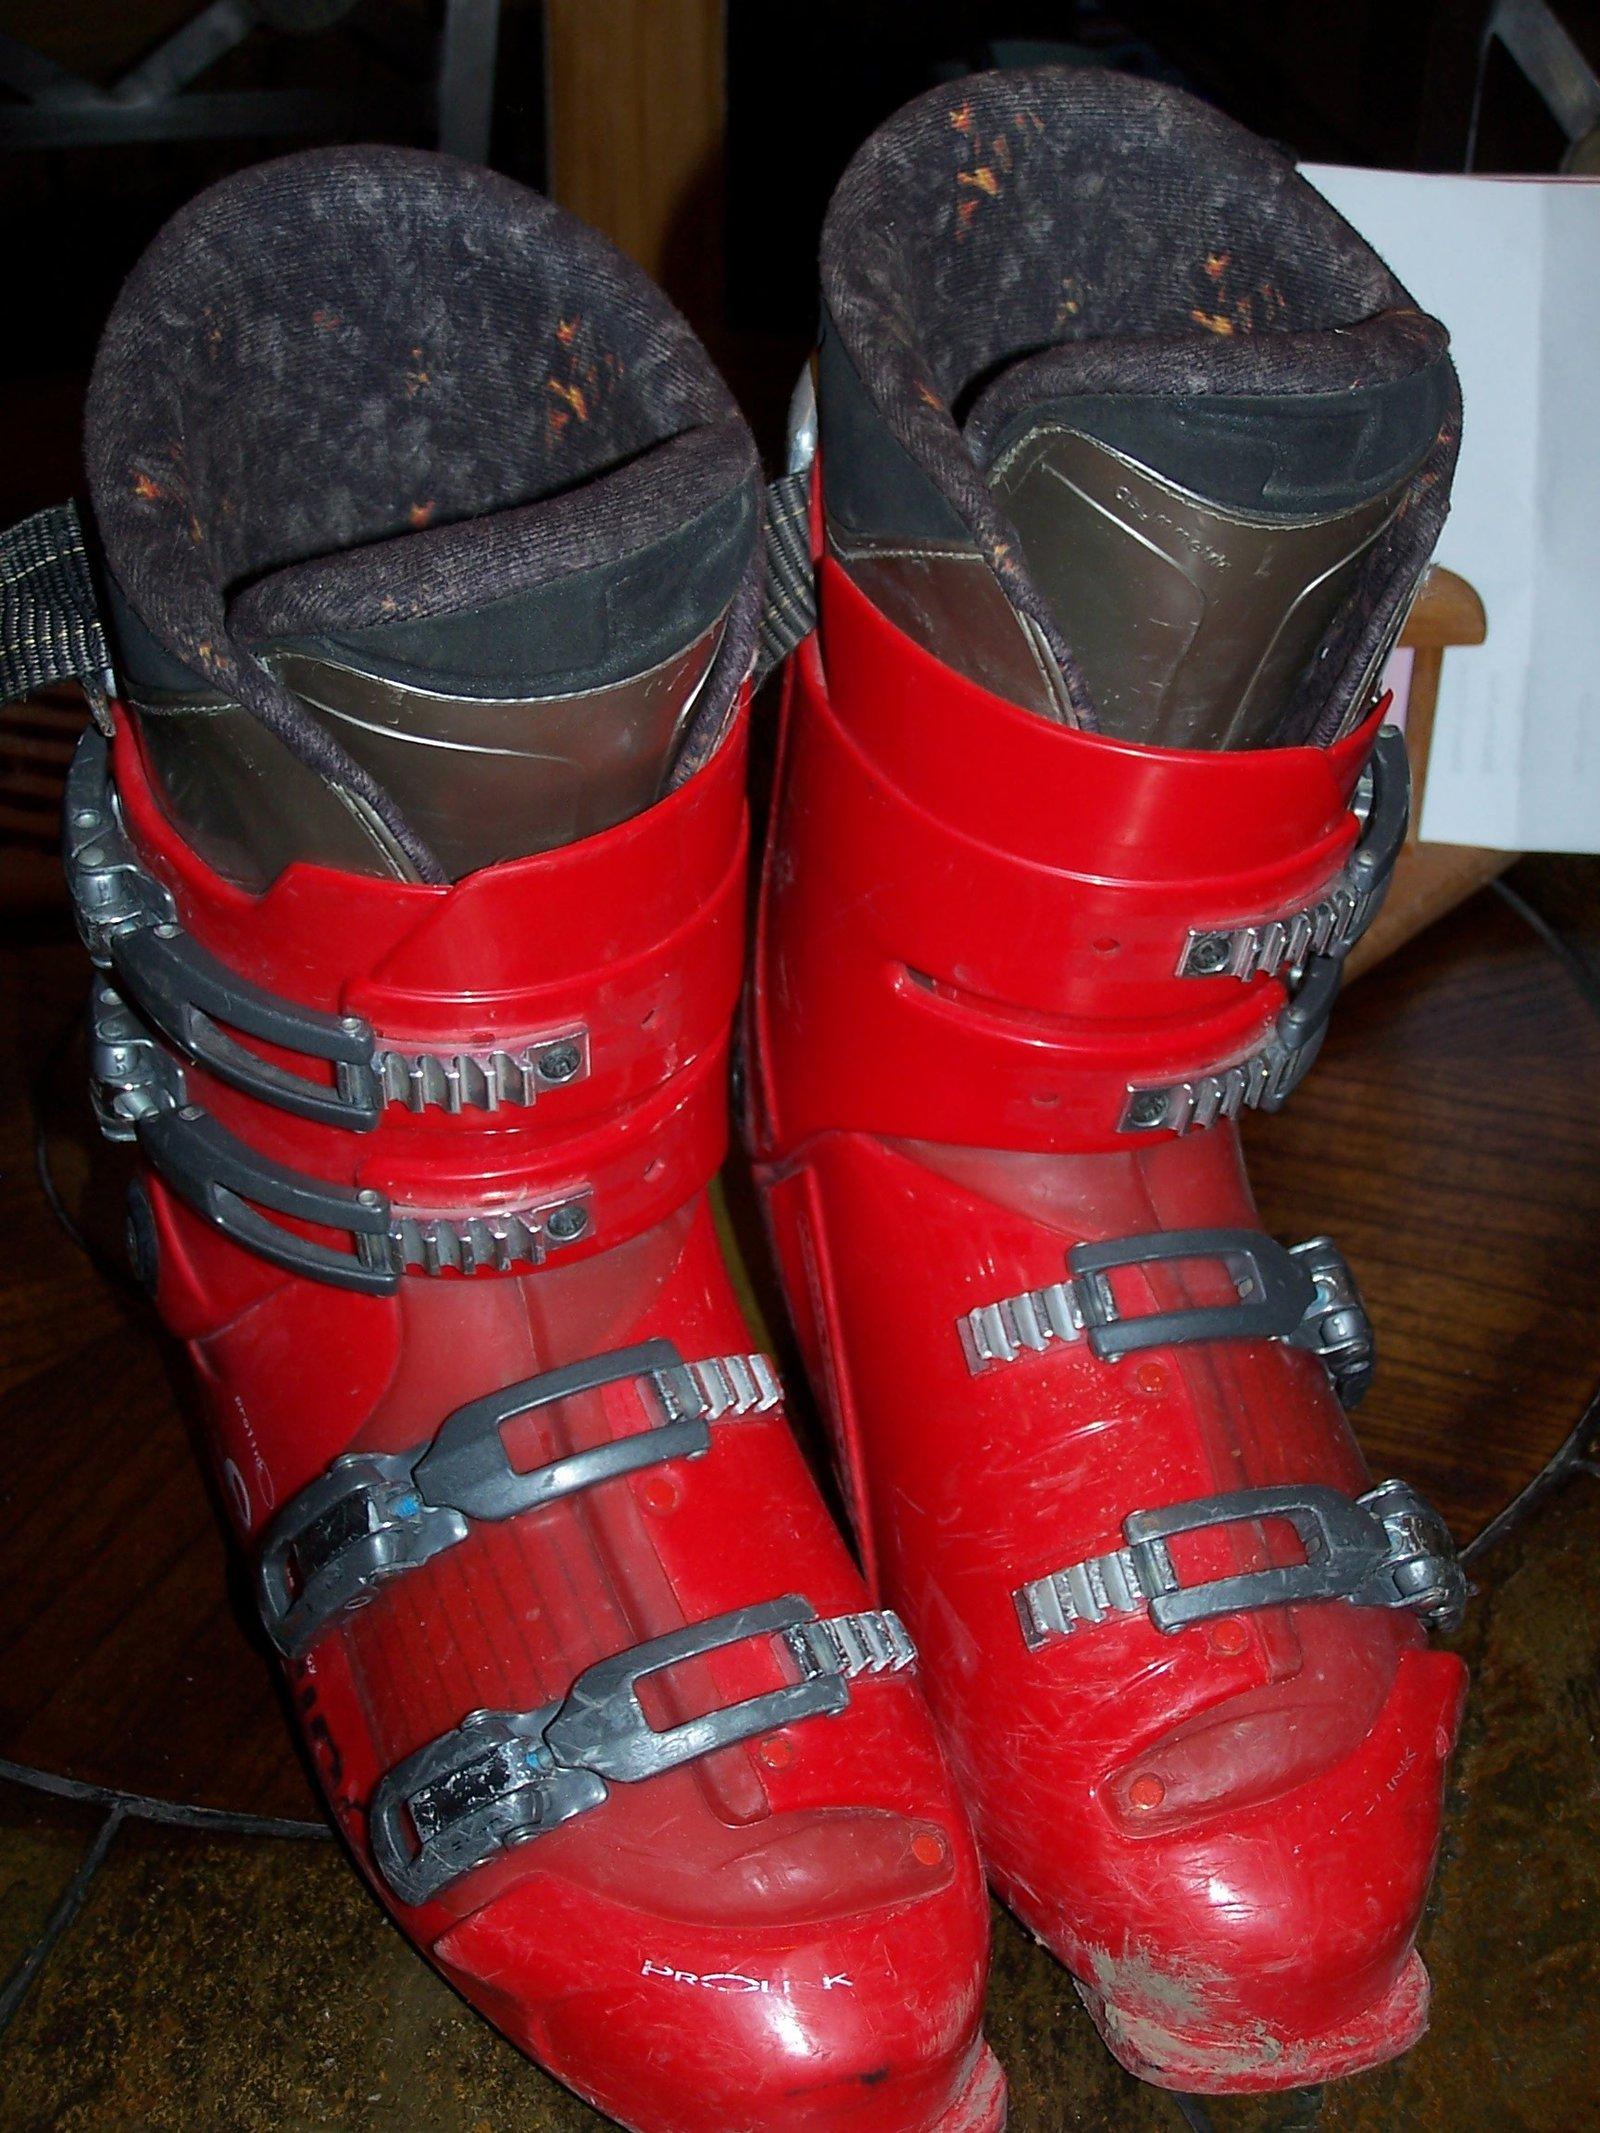 Salamon bootz